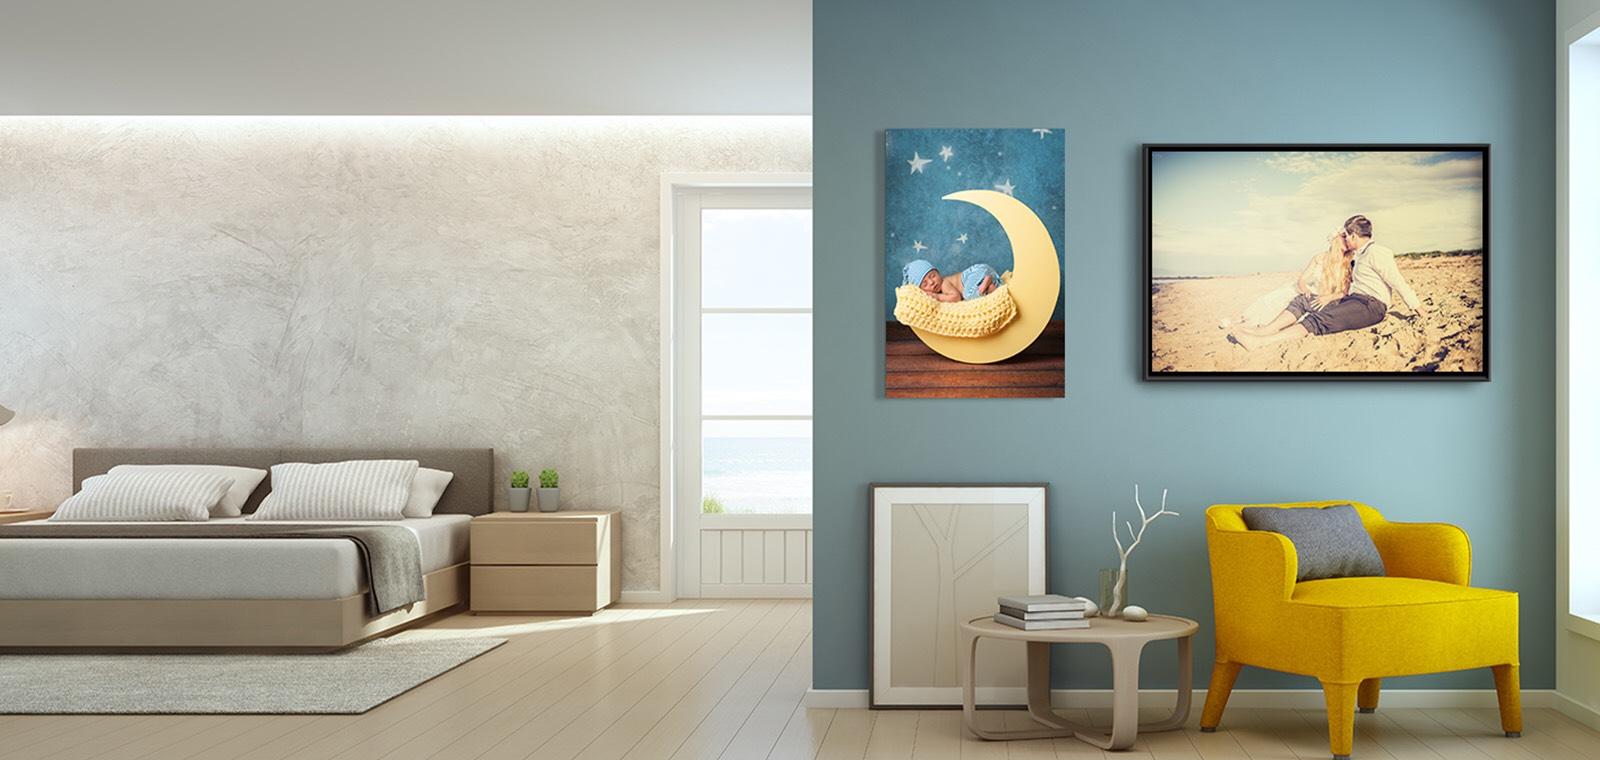 Saal Digital - 30% Nachlass auf Wandbilder, Karten, Minileporellos